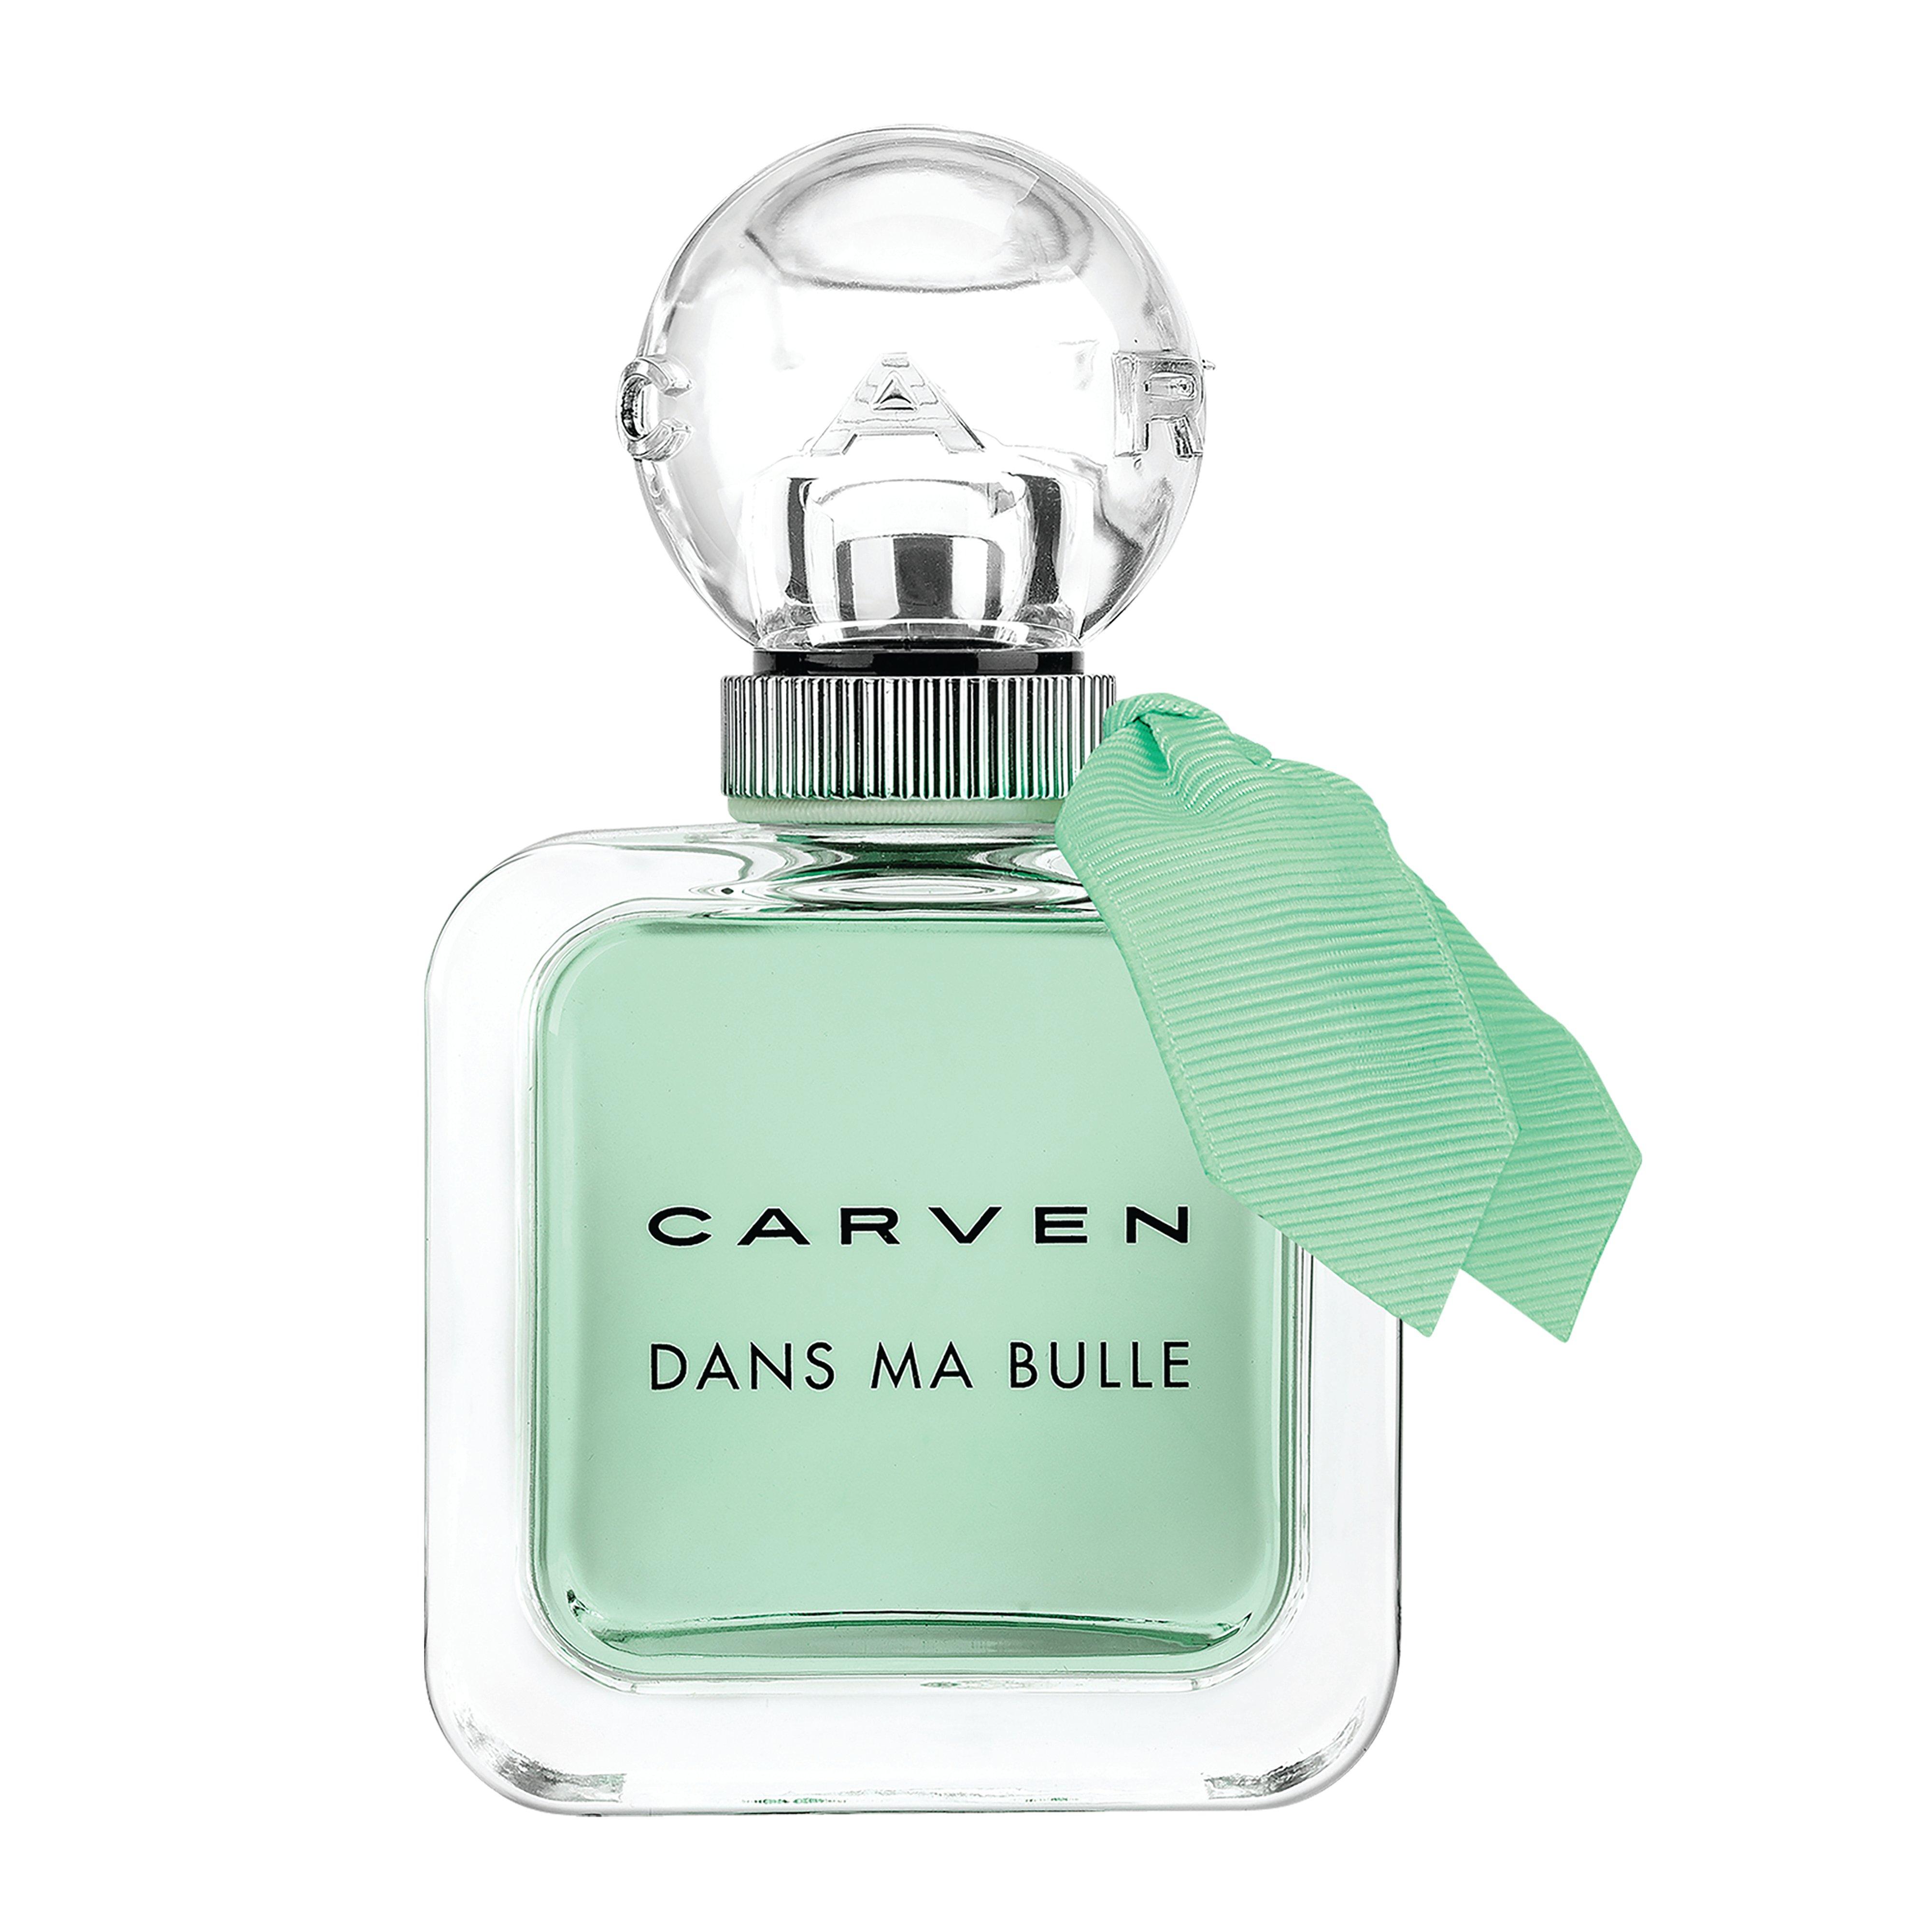 Carven - Dans Ma Bulle EDT 50 ml